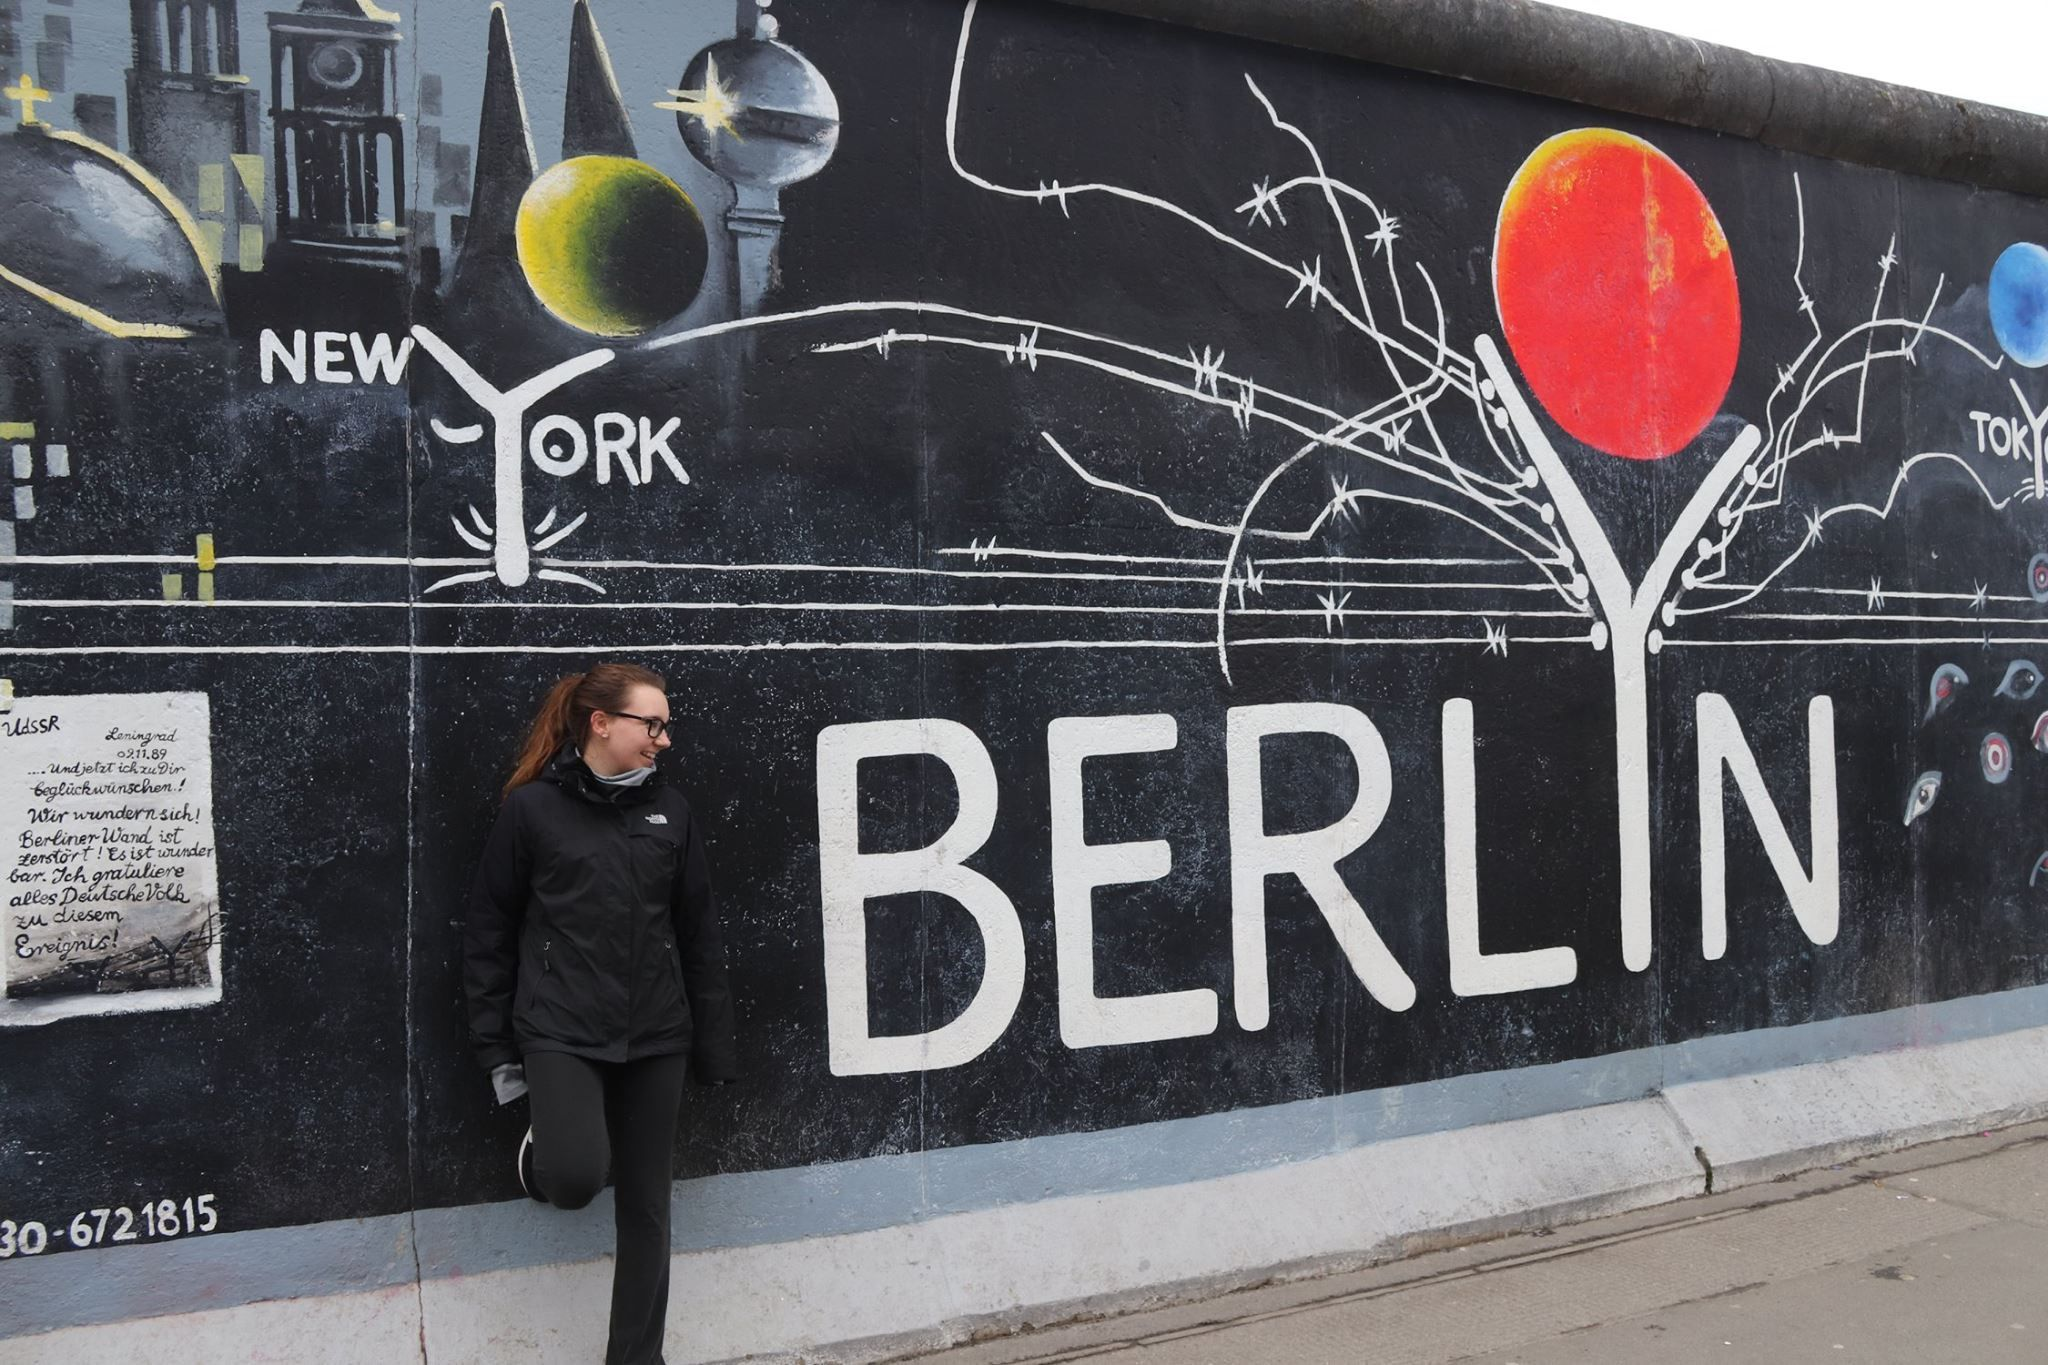 Berlin Wall Berlin Germany Germany Berlin Wall East Side Gallery Berlin Wall Art Graffiti Berlyn Instagr Berlin Photography East Side Gallery Berlin Wall